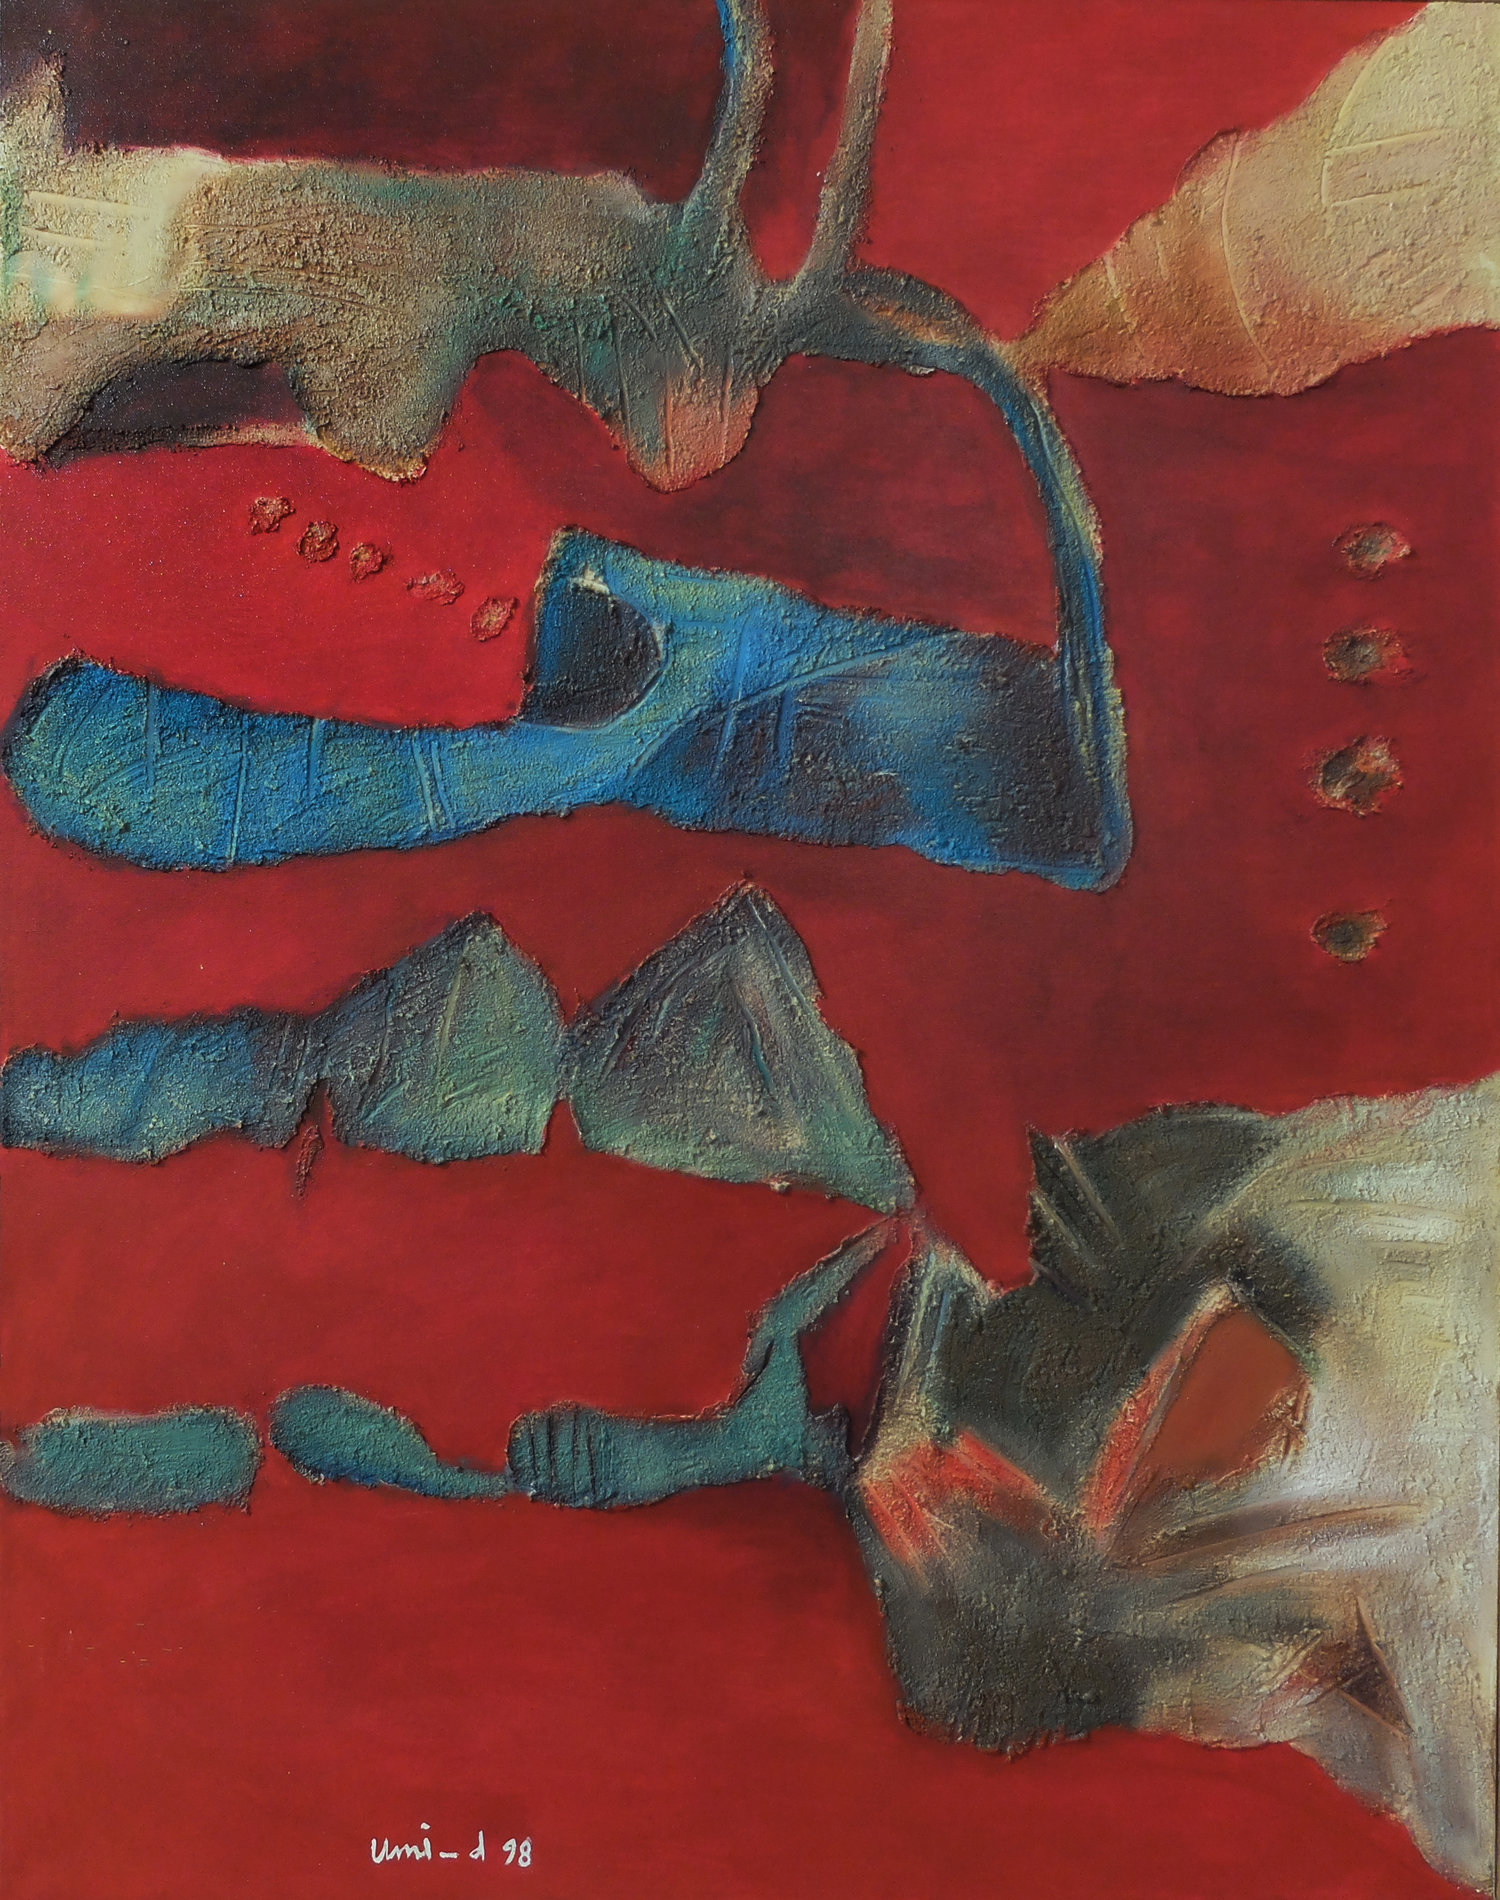 Umi Dachlan, Matador, oil on canvas, 95 x 75 cm, 1998